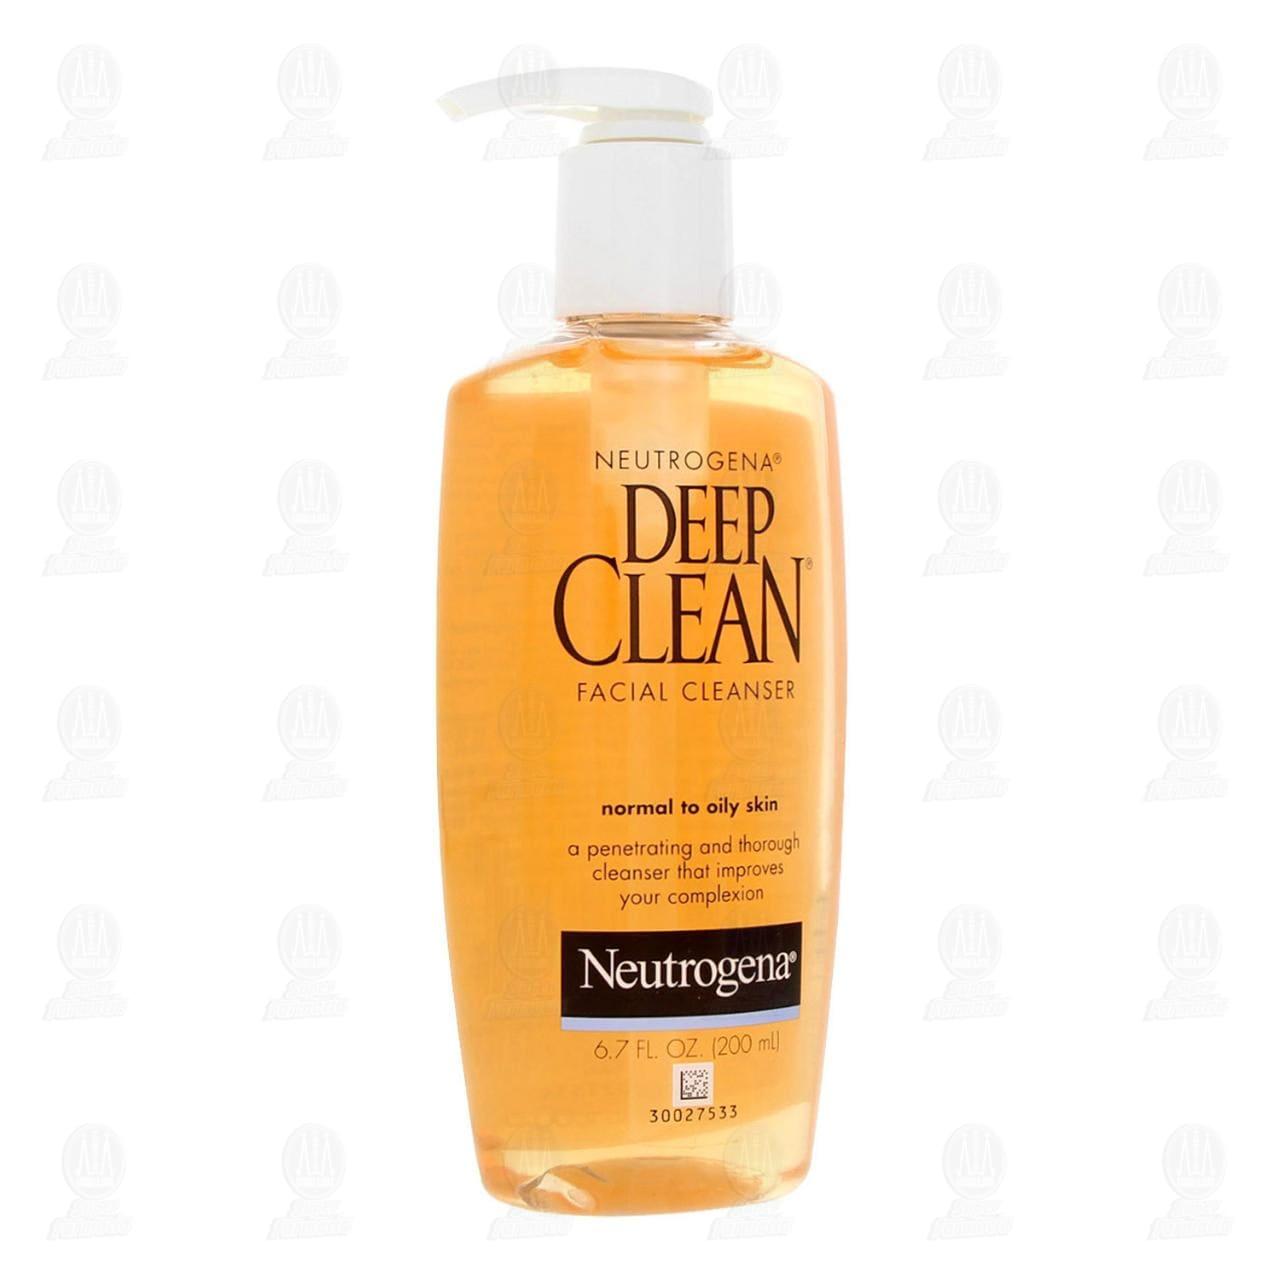 Comprar Limpiador Facial Neutrogena Deep Clean para Piel Normal a Mixta, 200 ml. en Farmacias Guadalajara